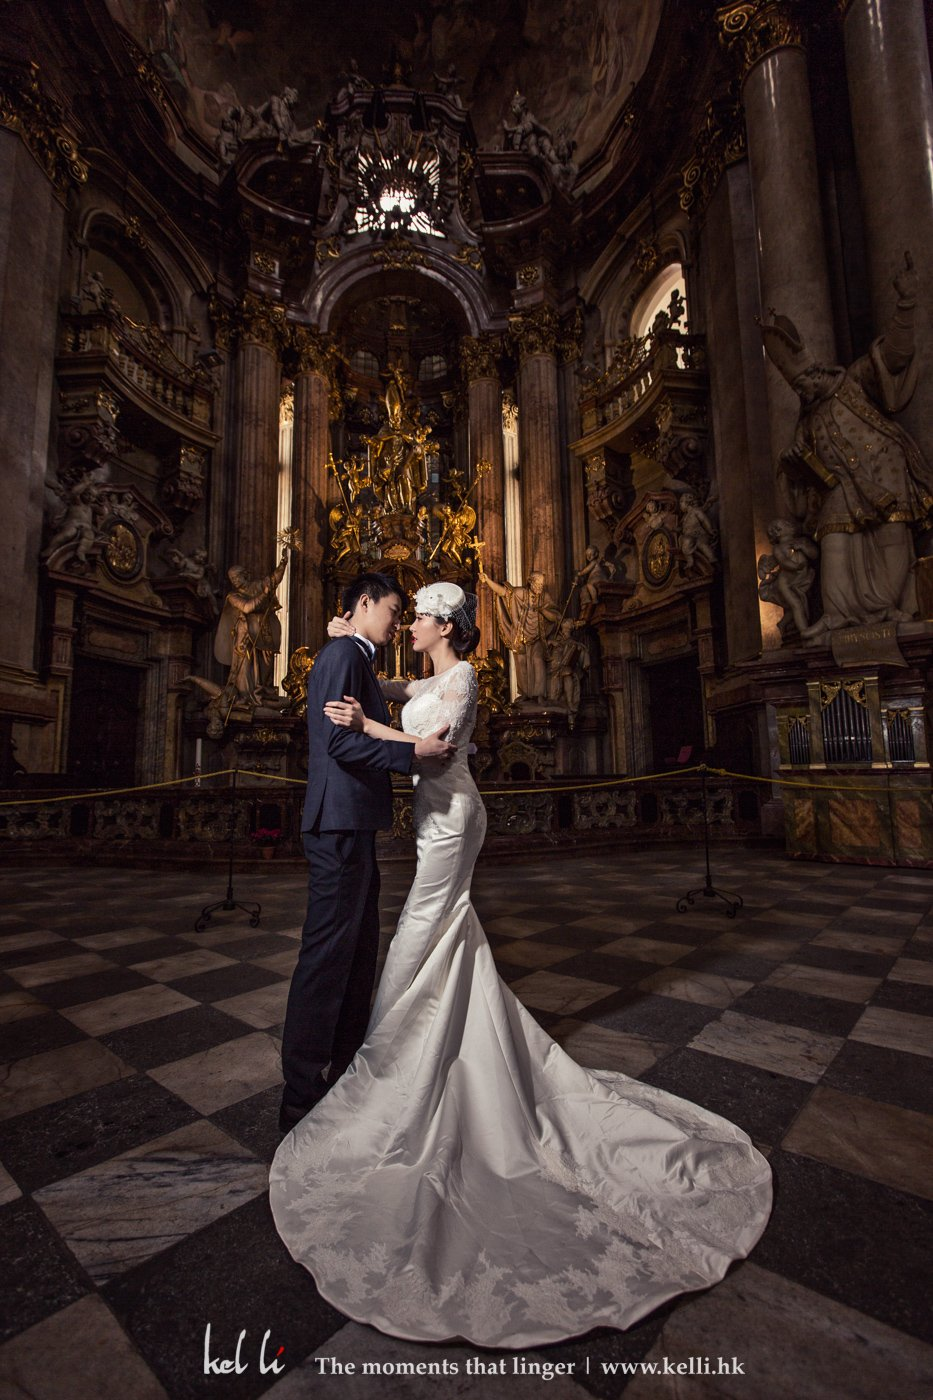 Pre-wedding in a historical church